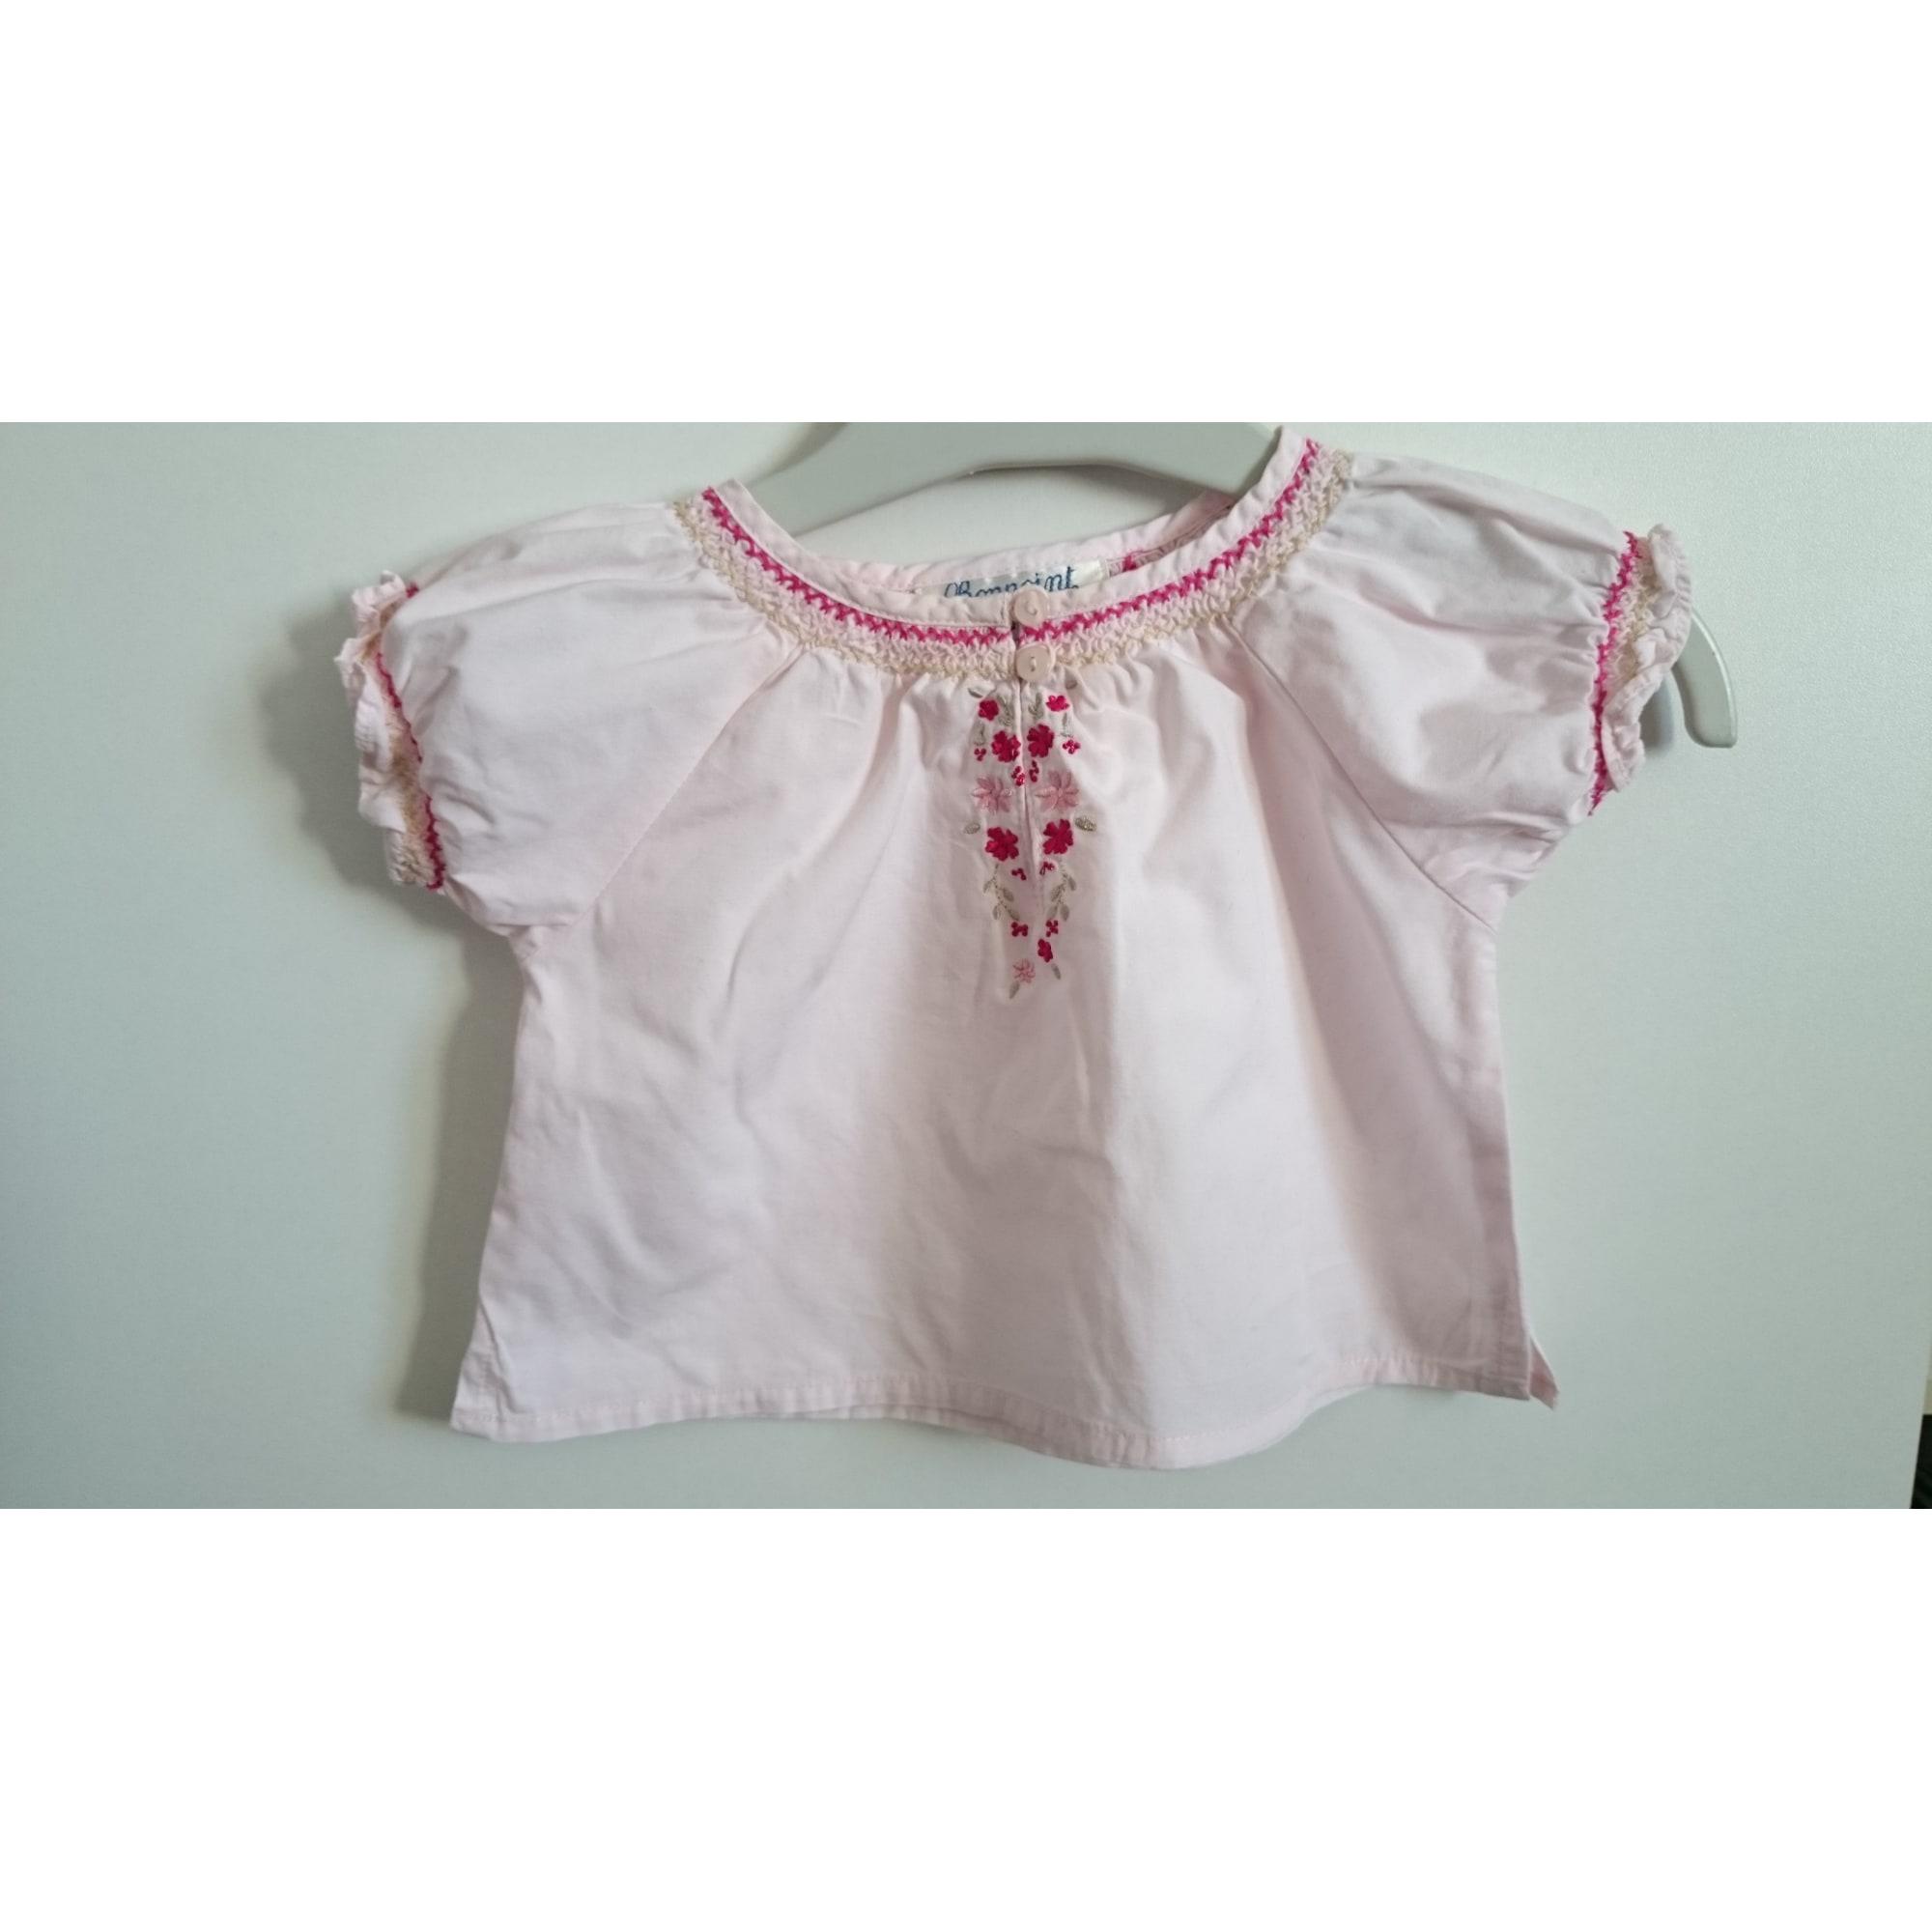 Chemisier, chemisette LA REDOUTE Rose, fuschia, vieux rose